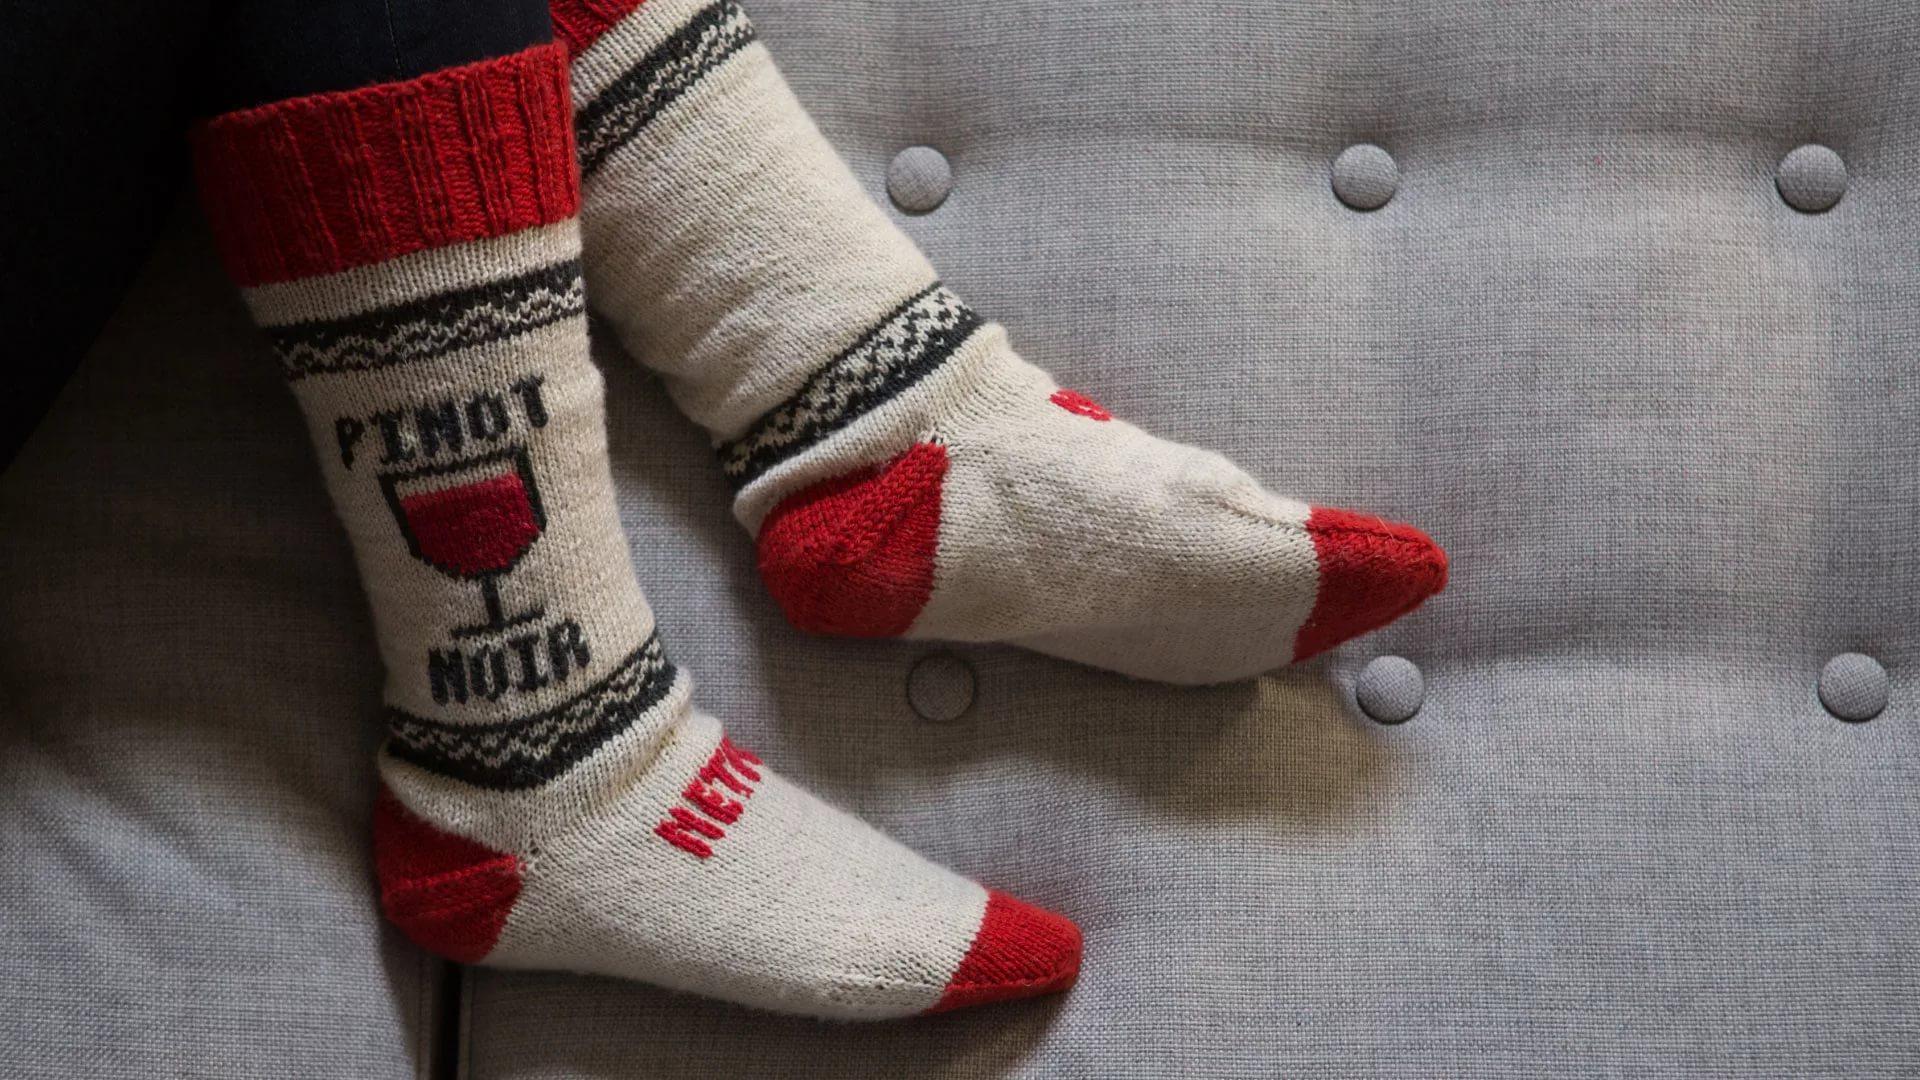 TOTAL SOCKS INDUSTRIES LTD – We believe in your design